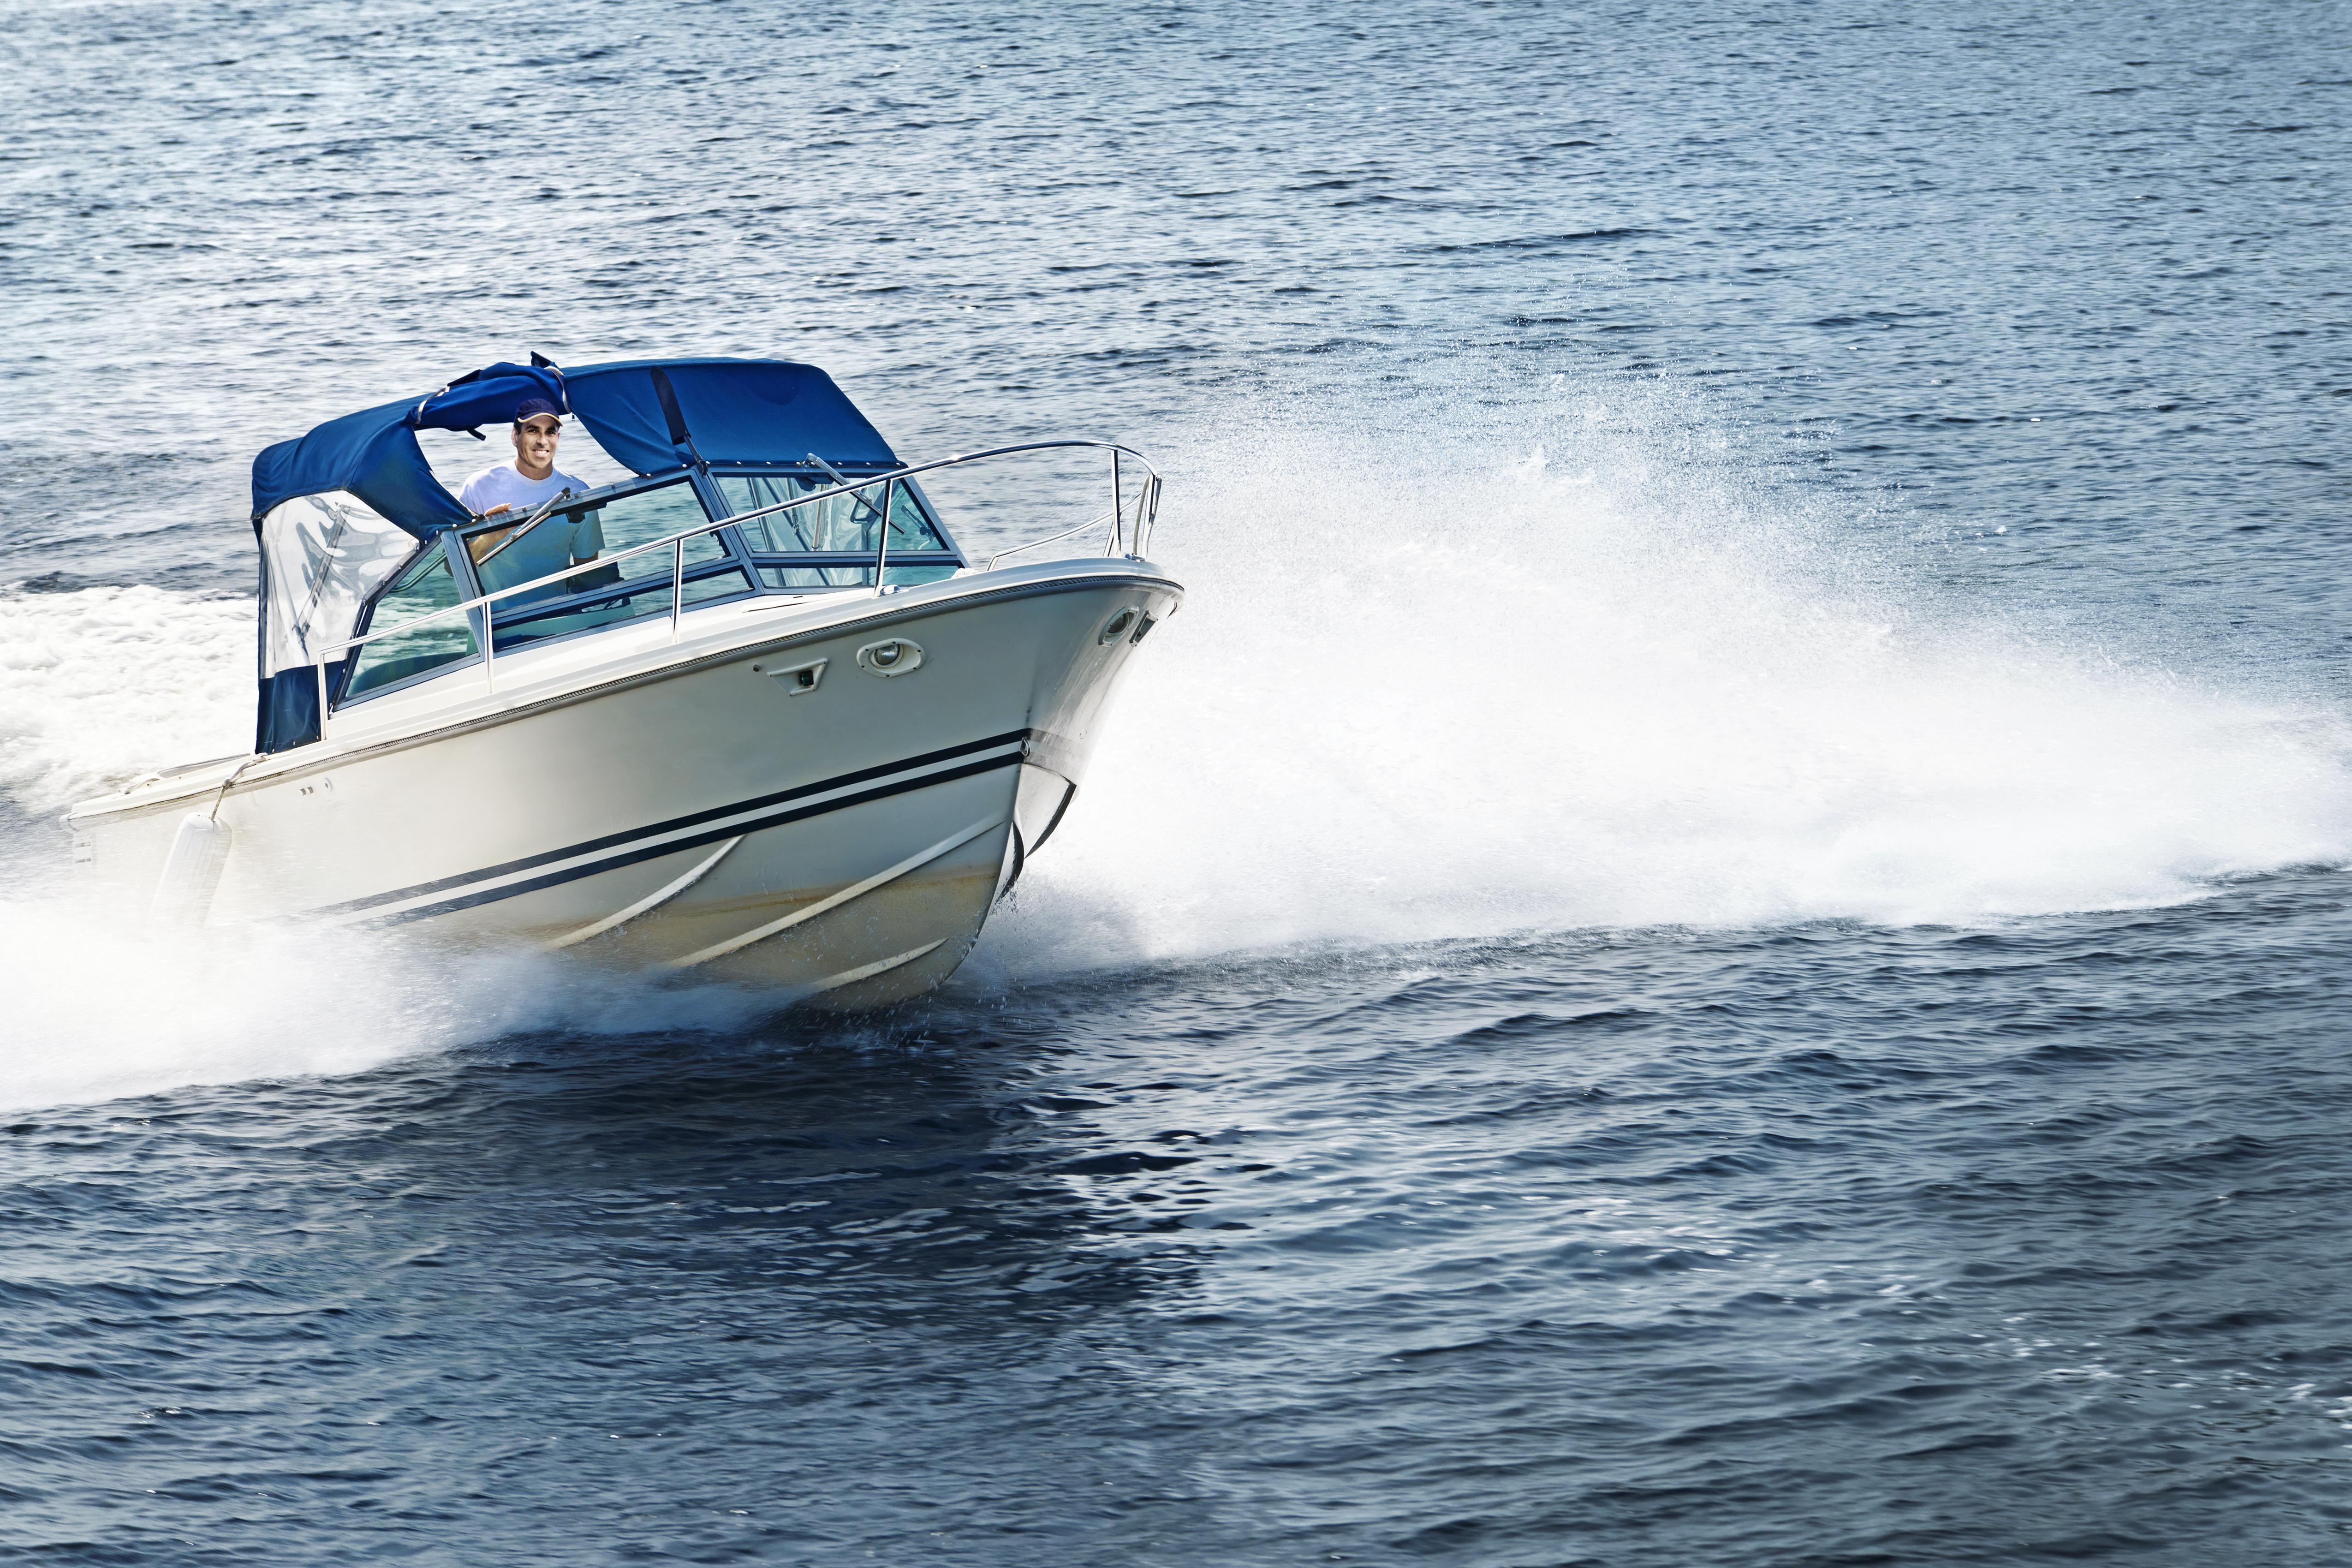 Canada, Ontario, Georgian Bay, Man in speed boat